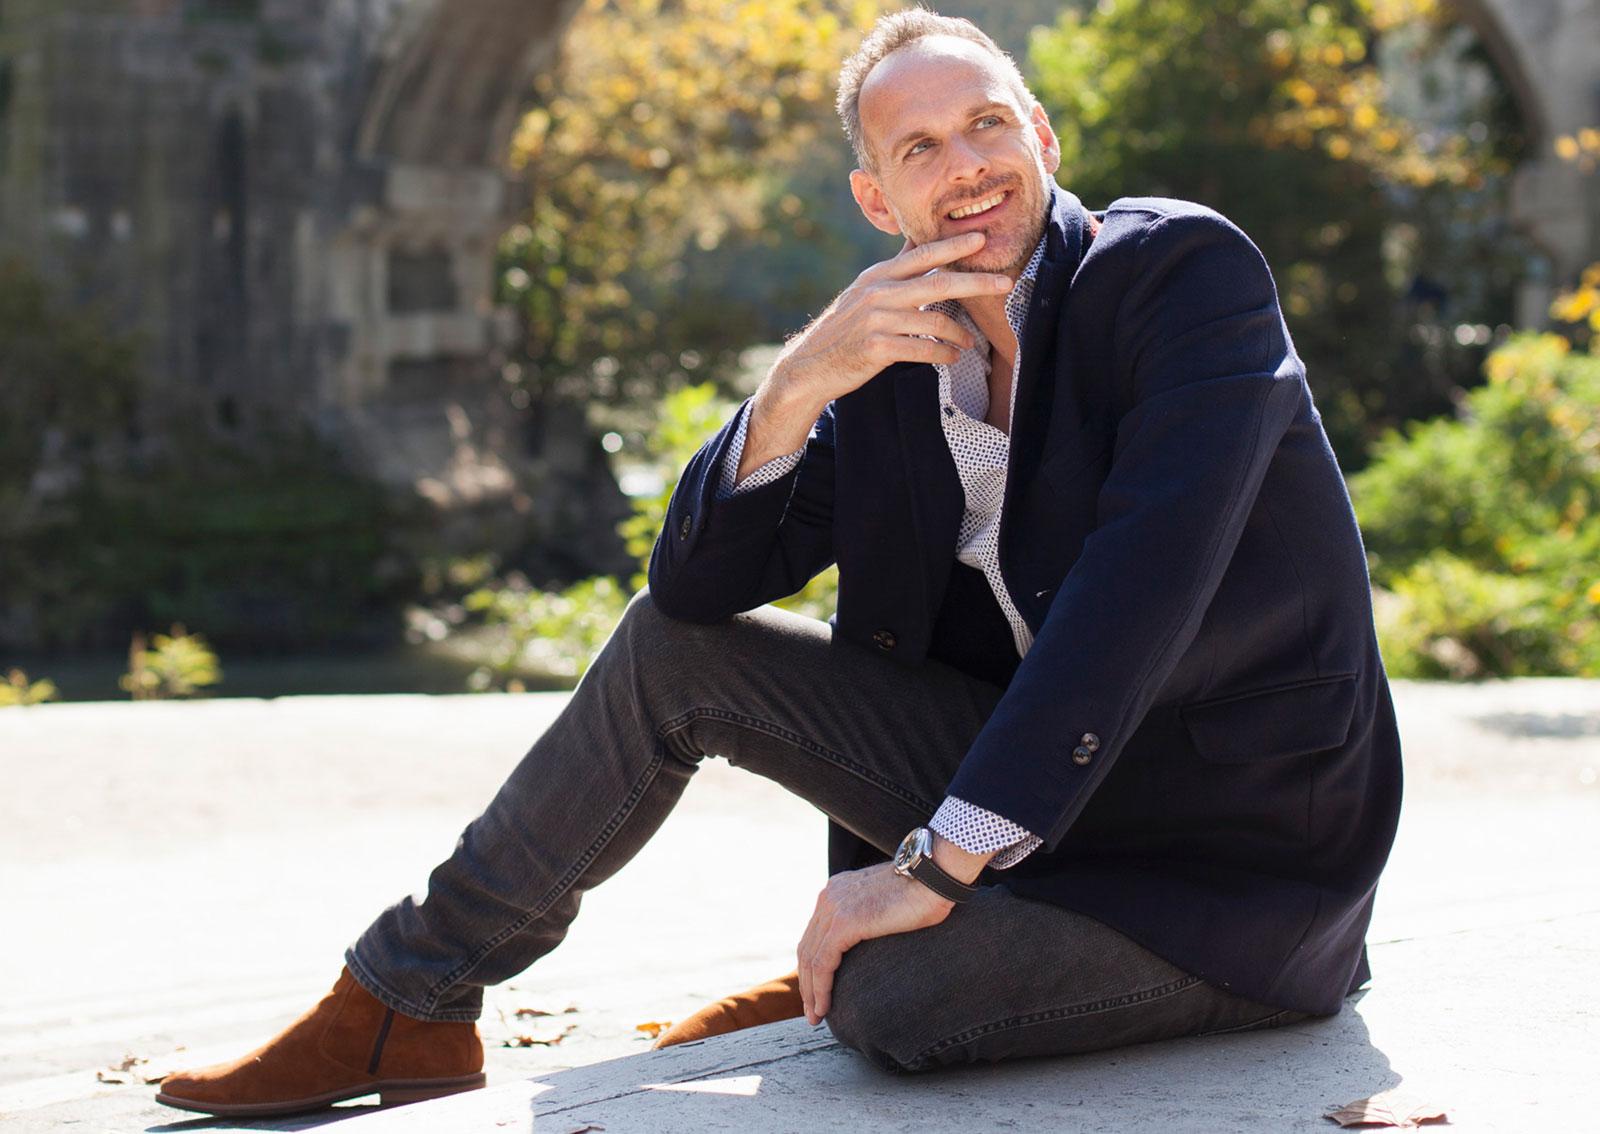 Marc Mühldorfer